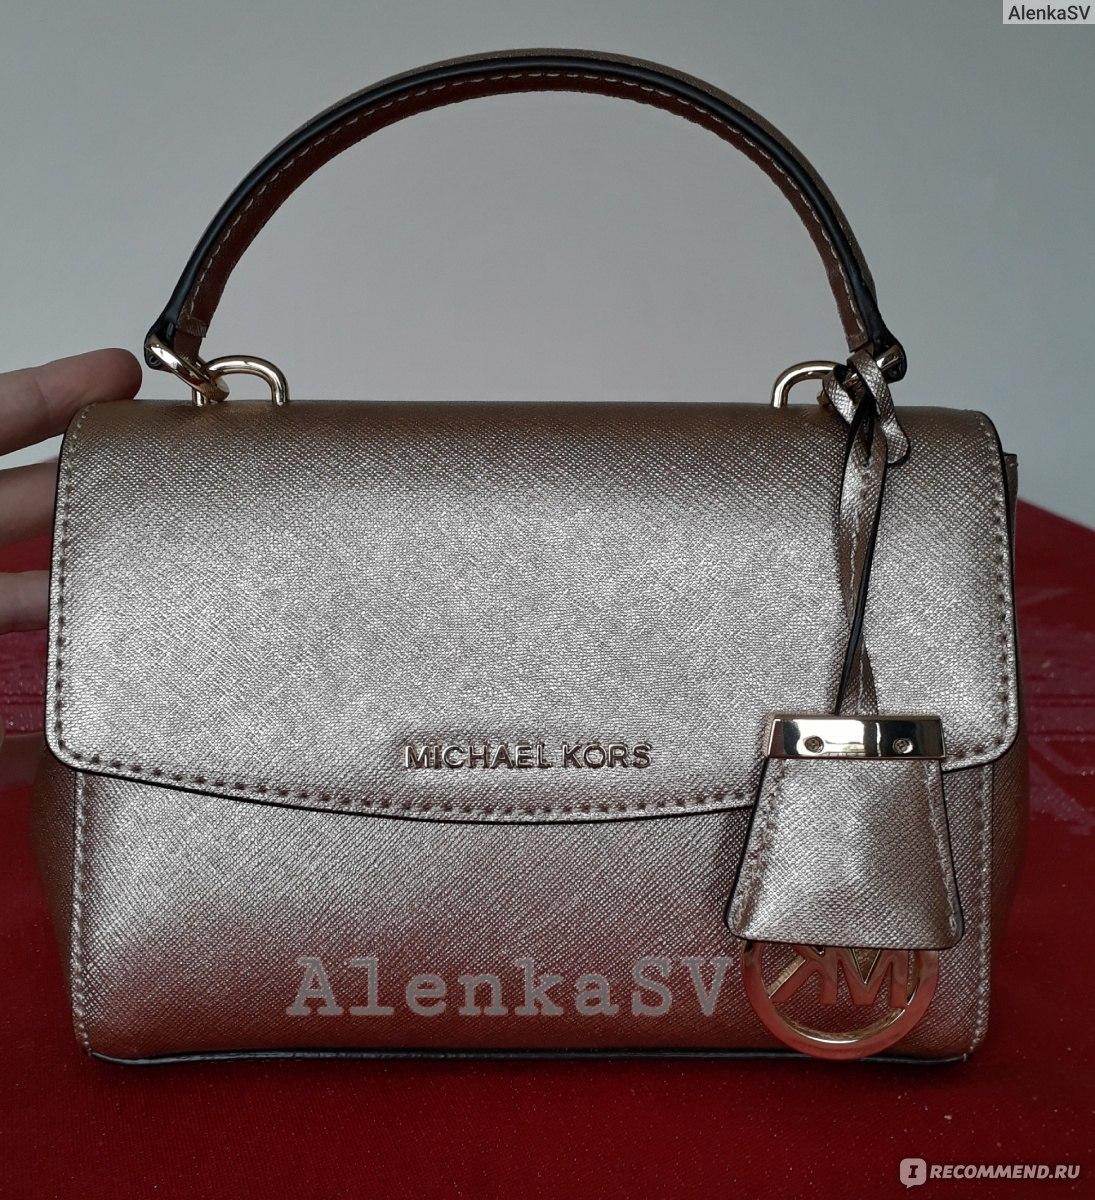 b482e48e212a Сумка из натуральной кожи Michael Kors Ava Extra-Small Saffiano Leather  Crossbody фото